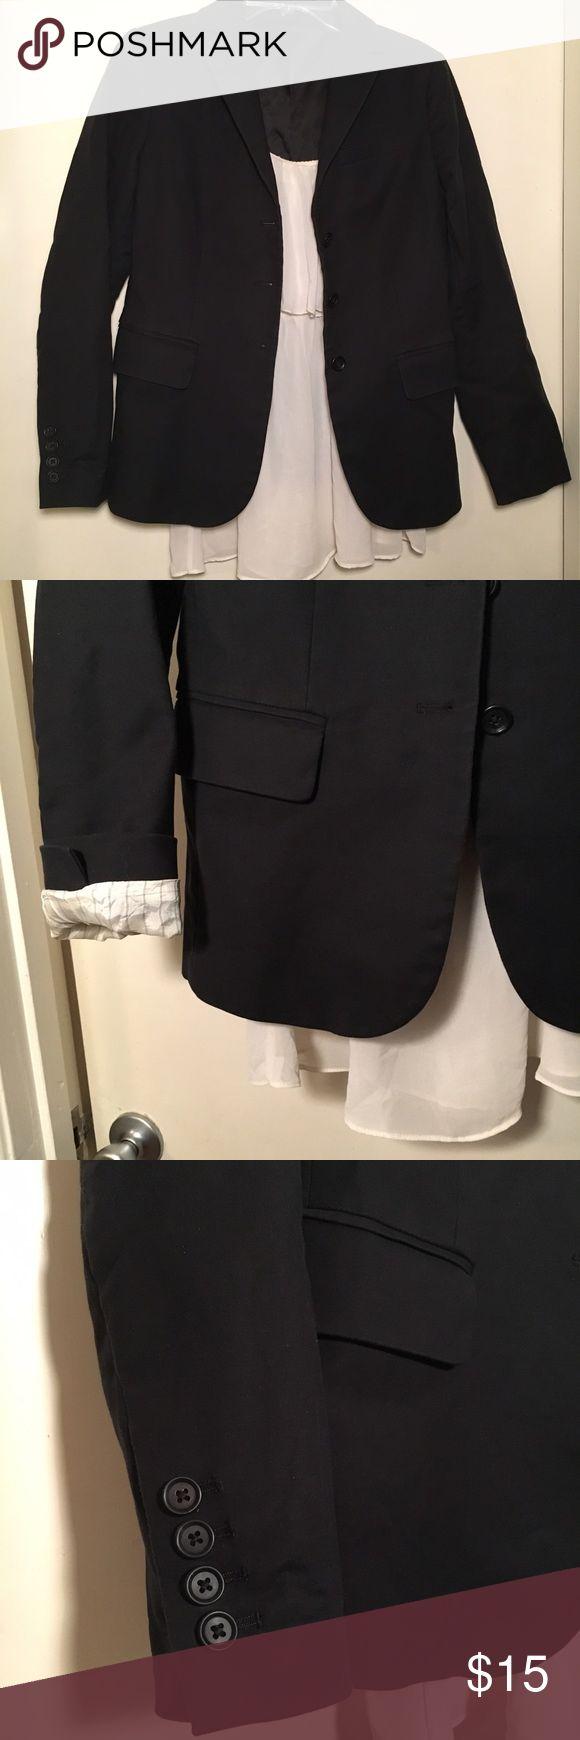 💻Basic black Gap blazer w optional roll up sleeve 💻 Basic black Gap blazer w optional roll up sleeves, fully lined, good condition GAP Jackets & Coats Blazers